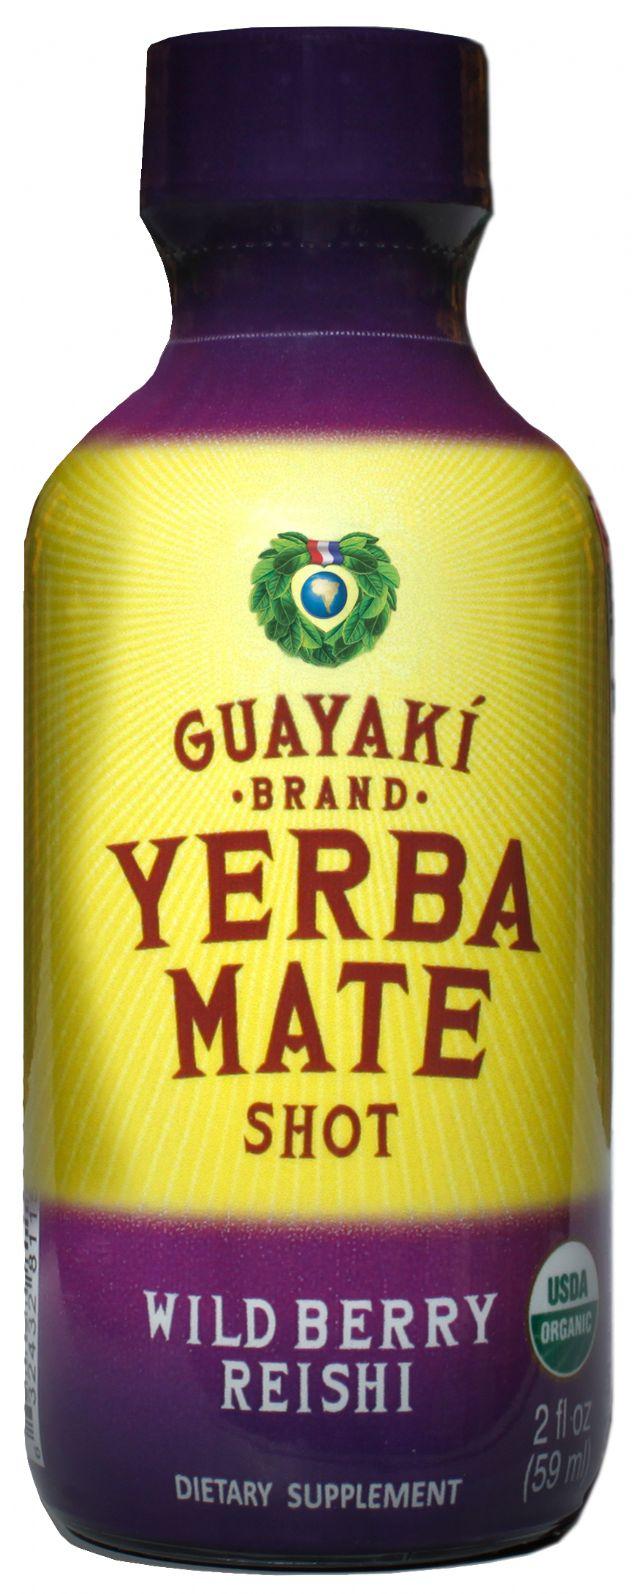 Guayaki Organic Energy Shot: reishi shot